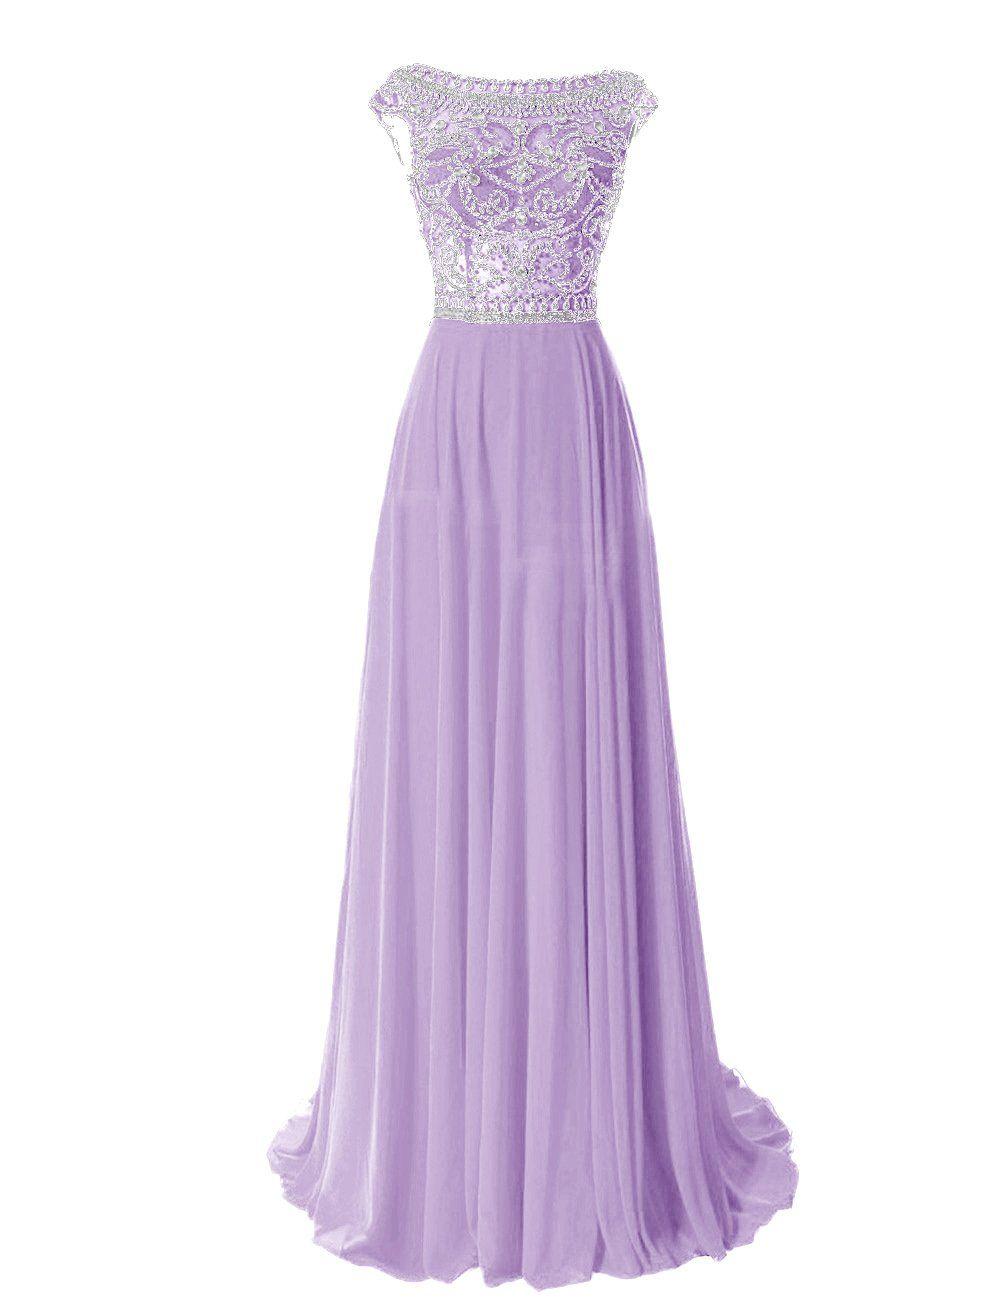 Tidetell Elegant Floor Length Bridesmaid Cap Sleeve Prom Evening ...